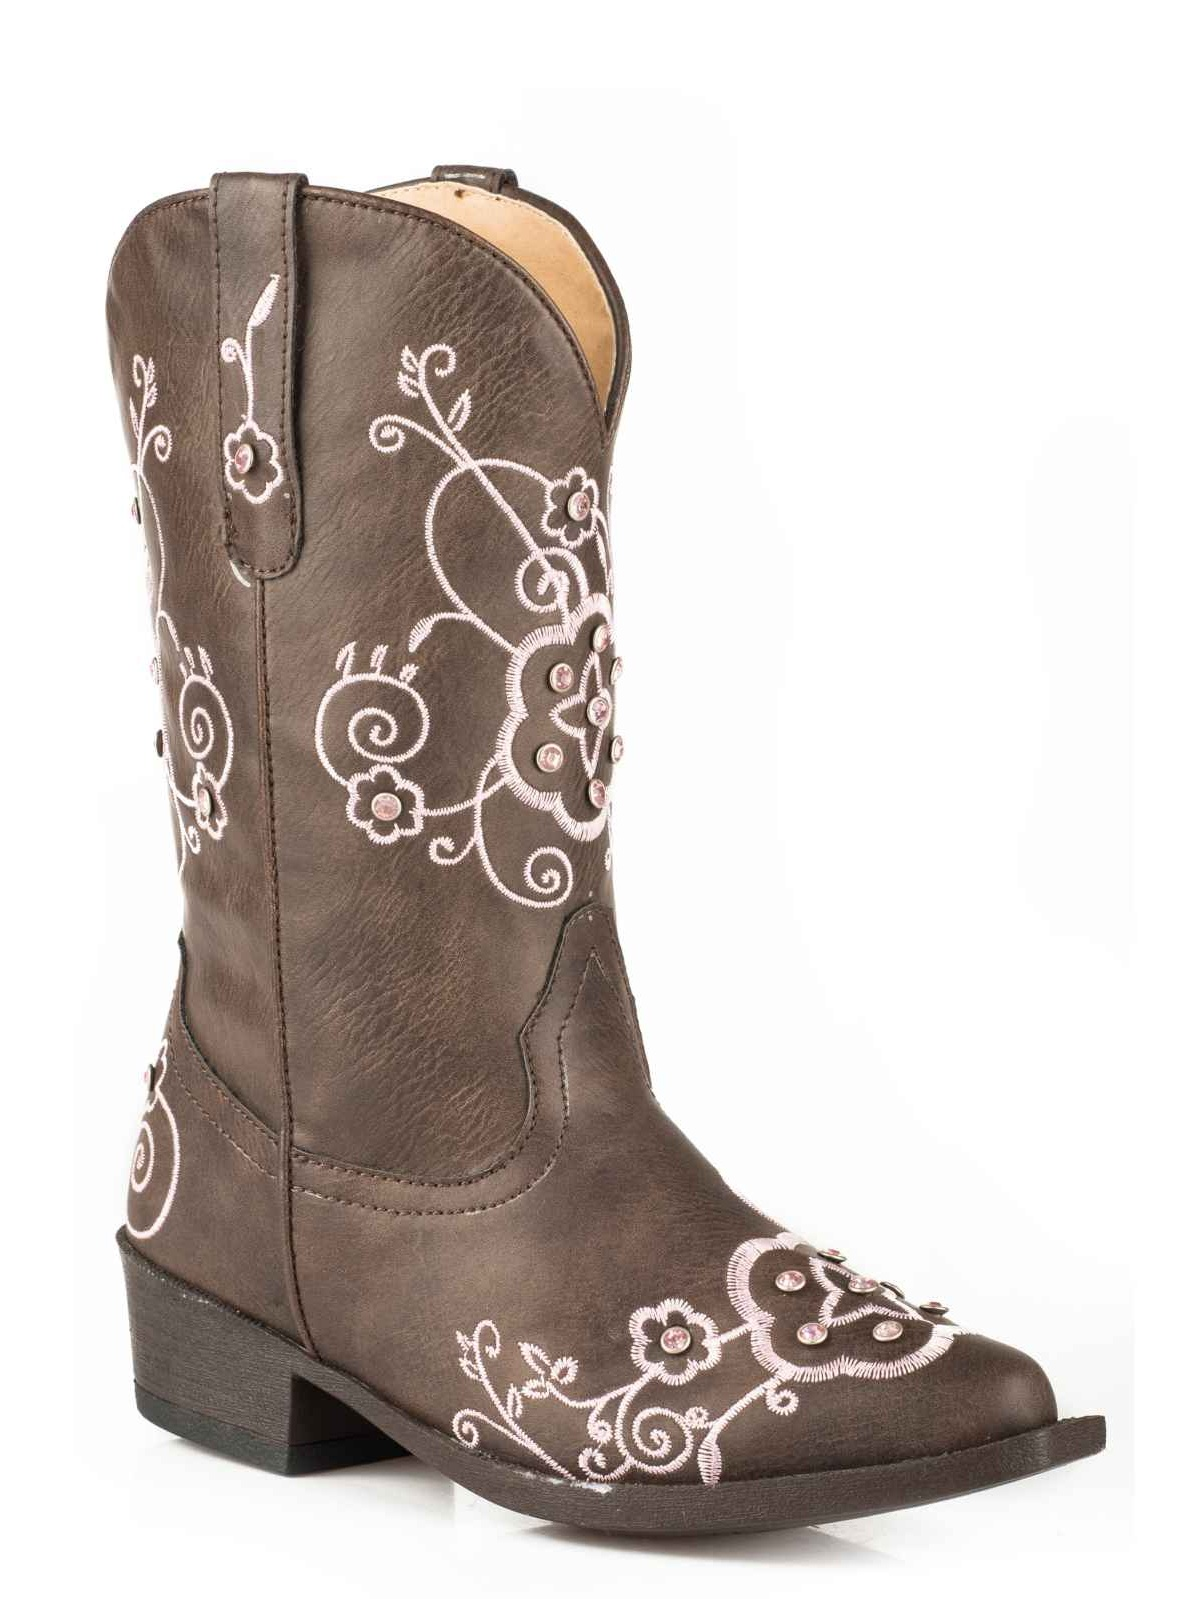 Roper Girls' Flower Sparkles Western Boot Br Pointed Toe - 09-018-1556-1139 Br Boot bdf5c2